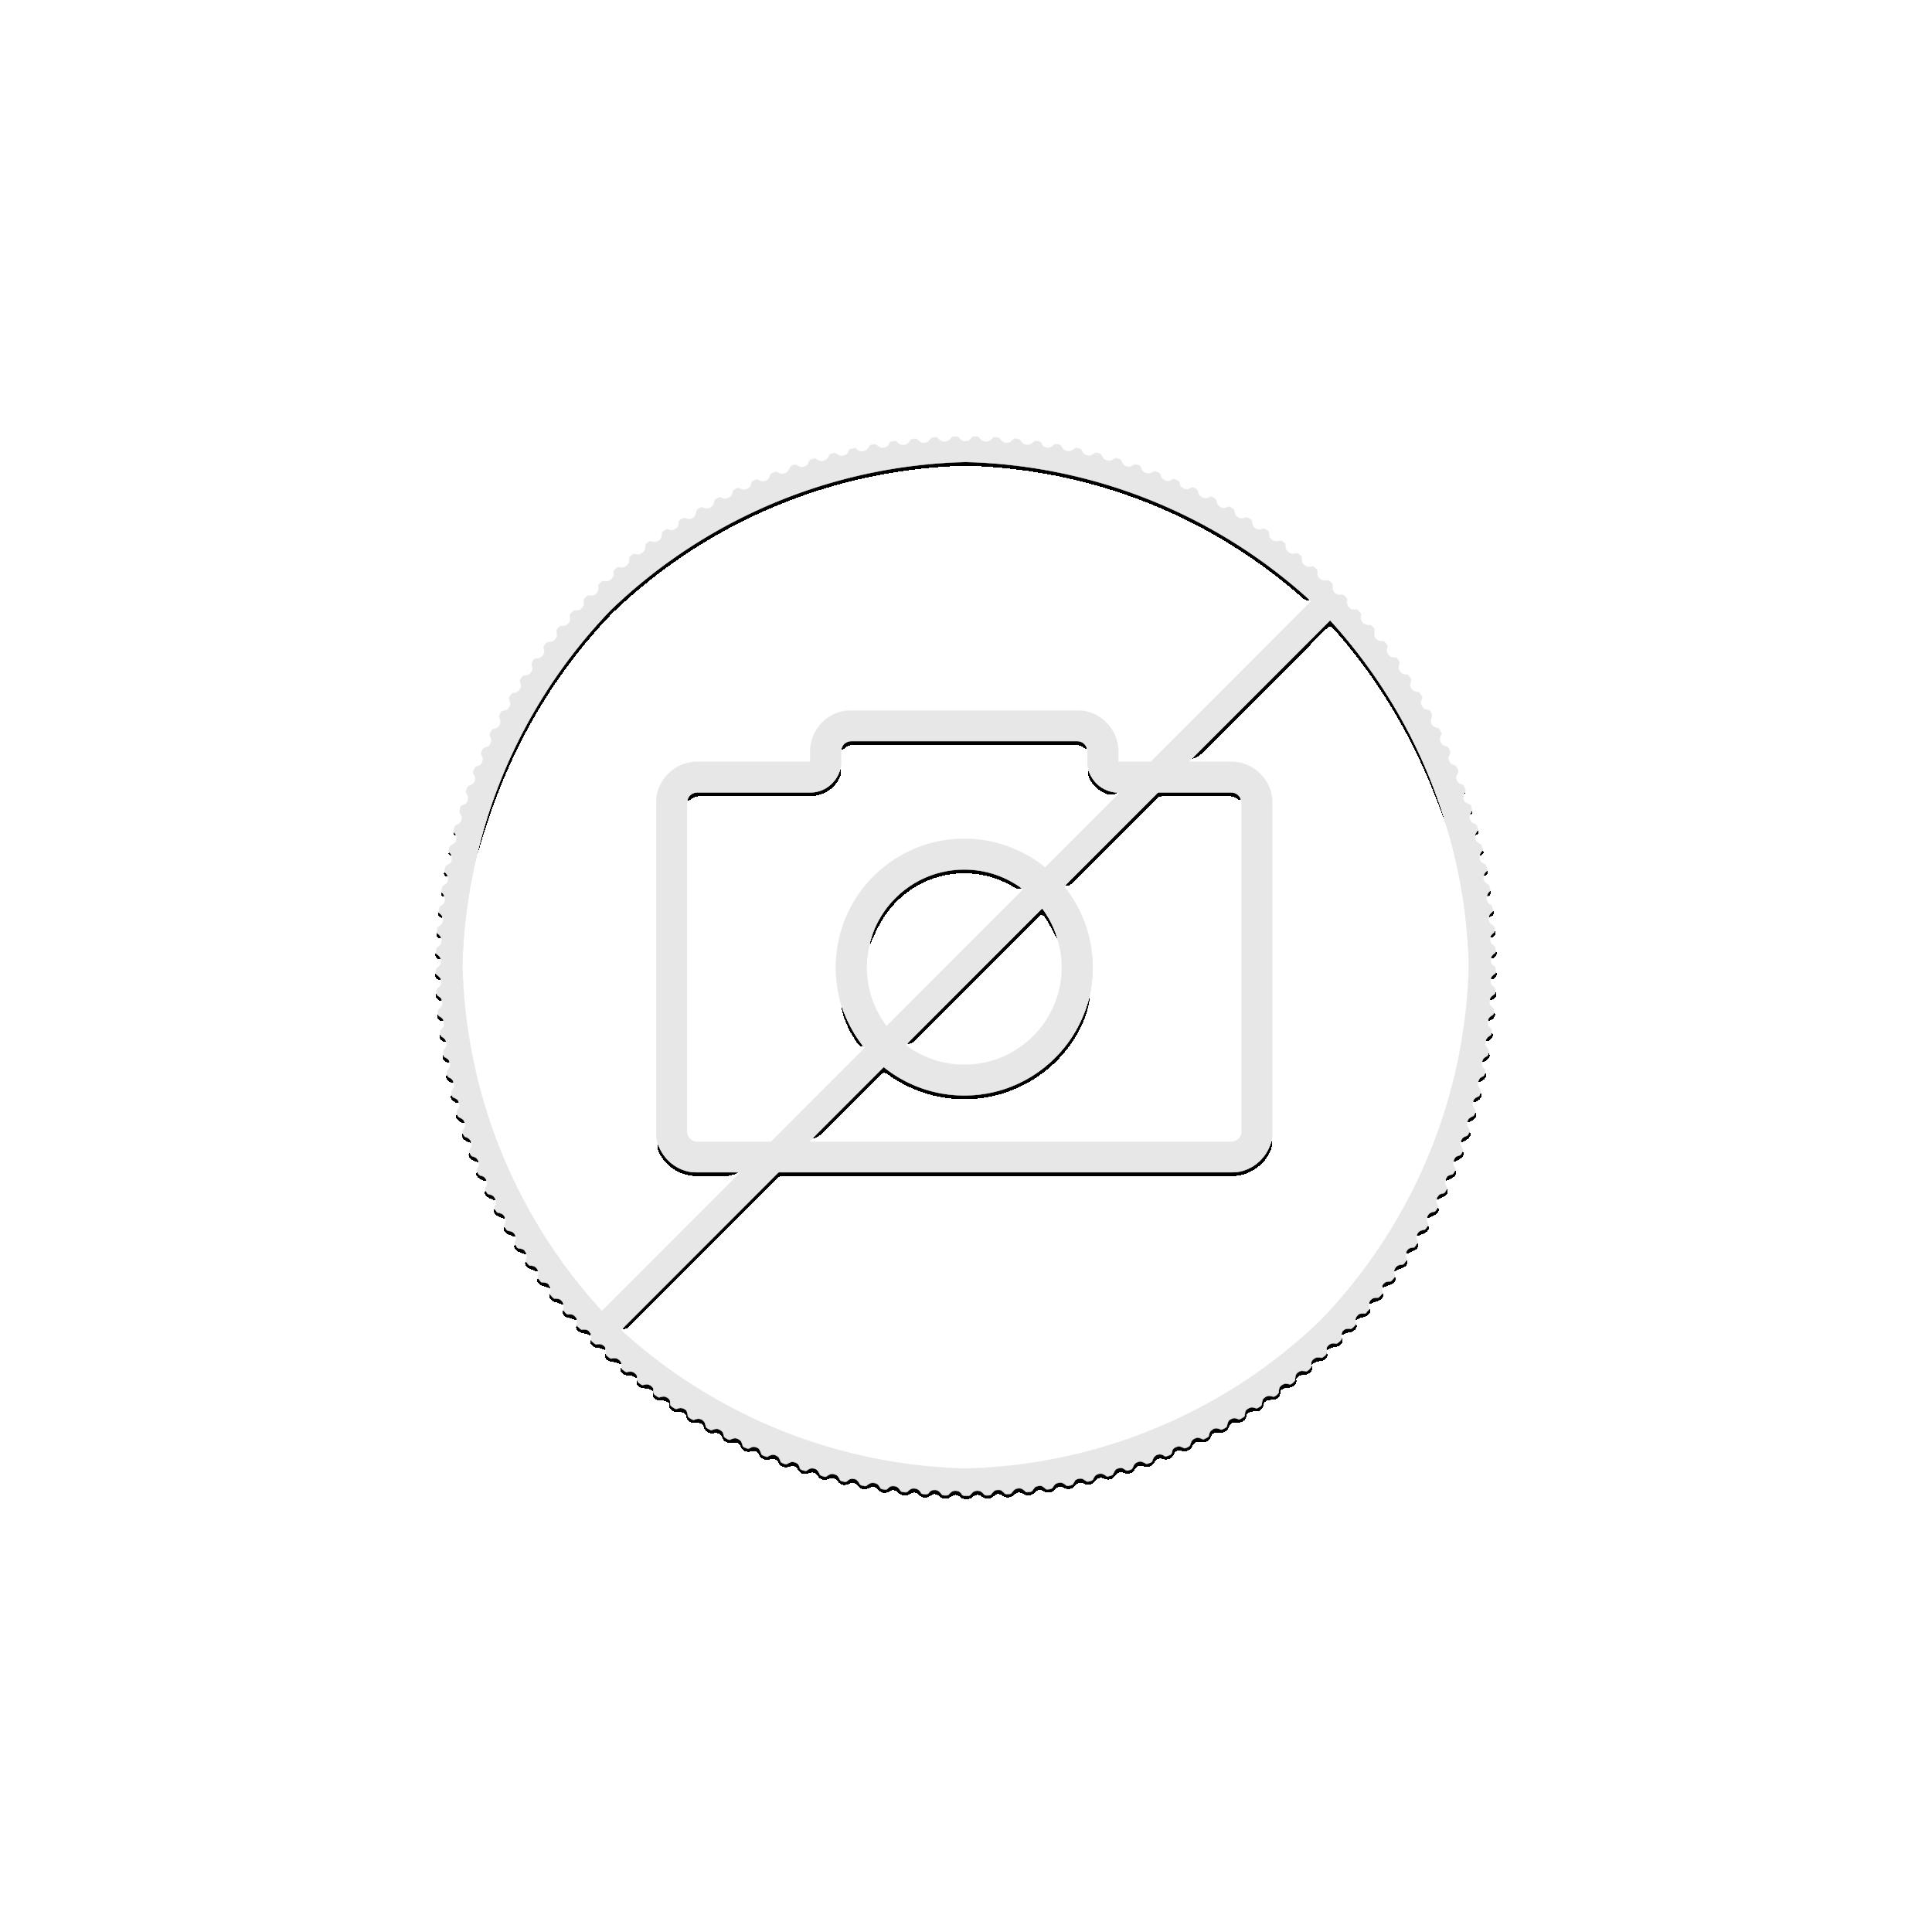 The Silver Mountain Box voor 100 zilveren Silver Eagle munten